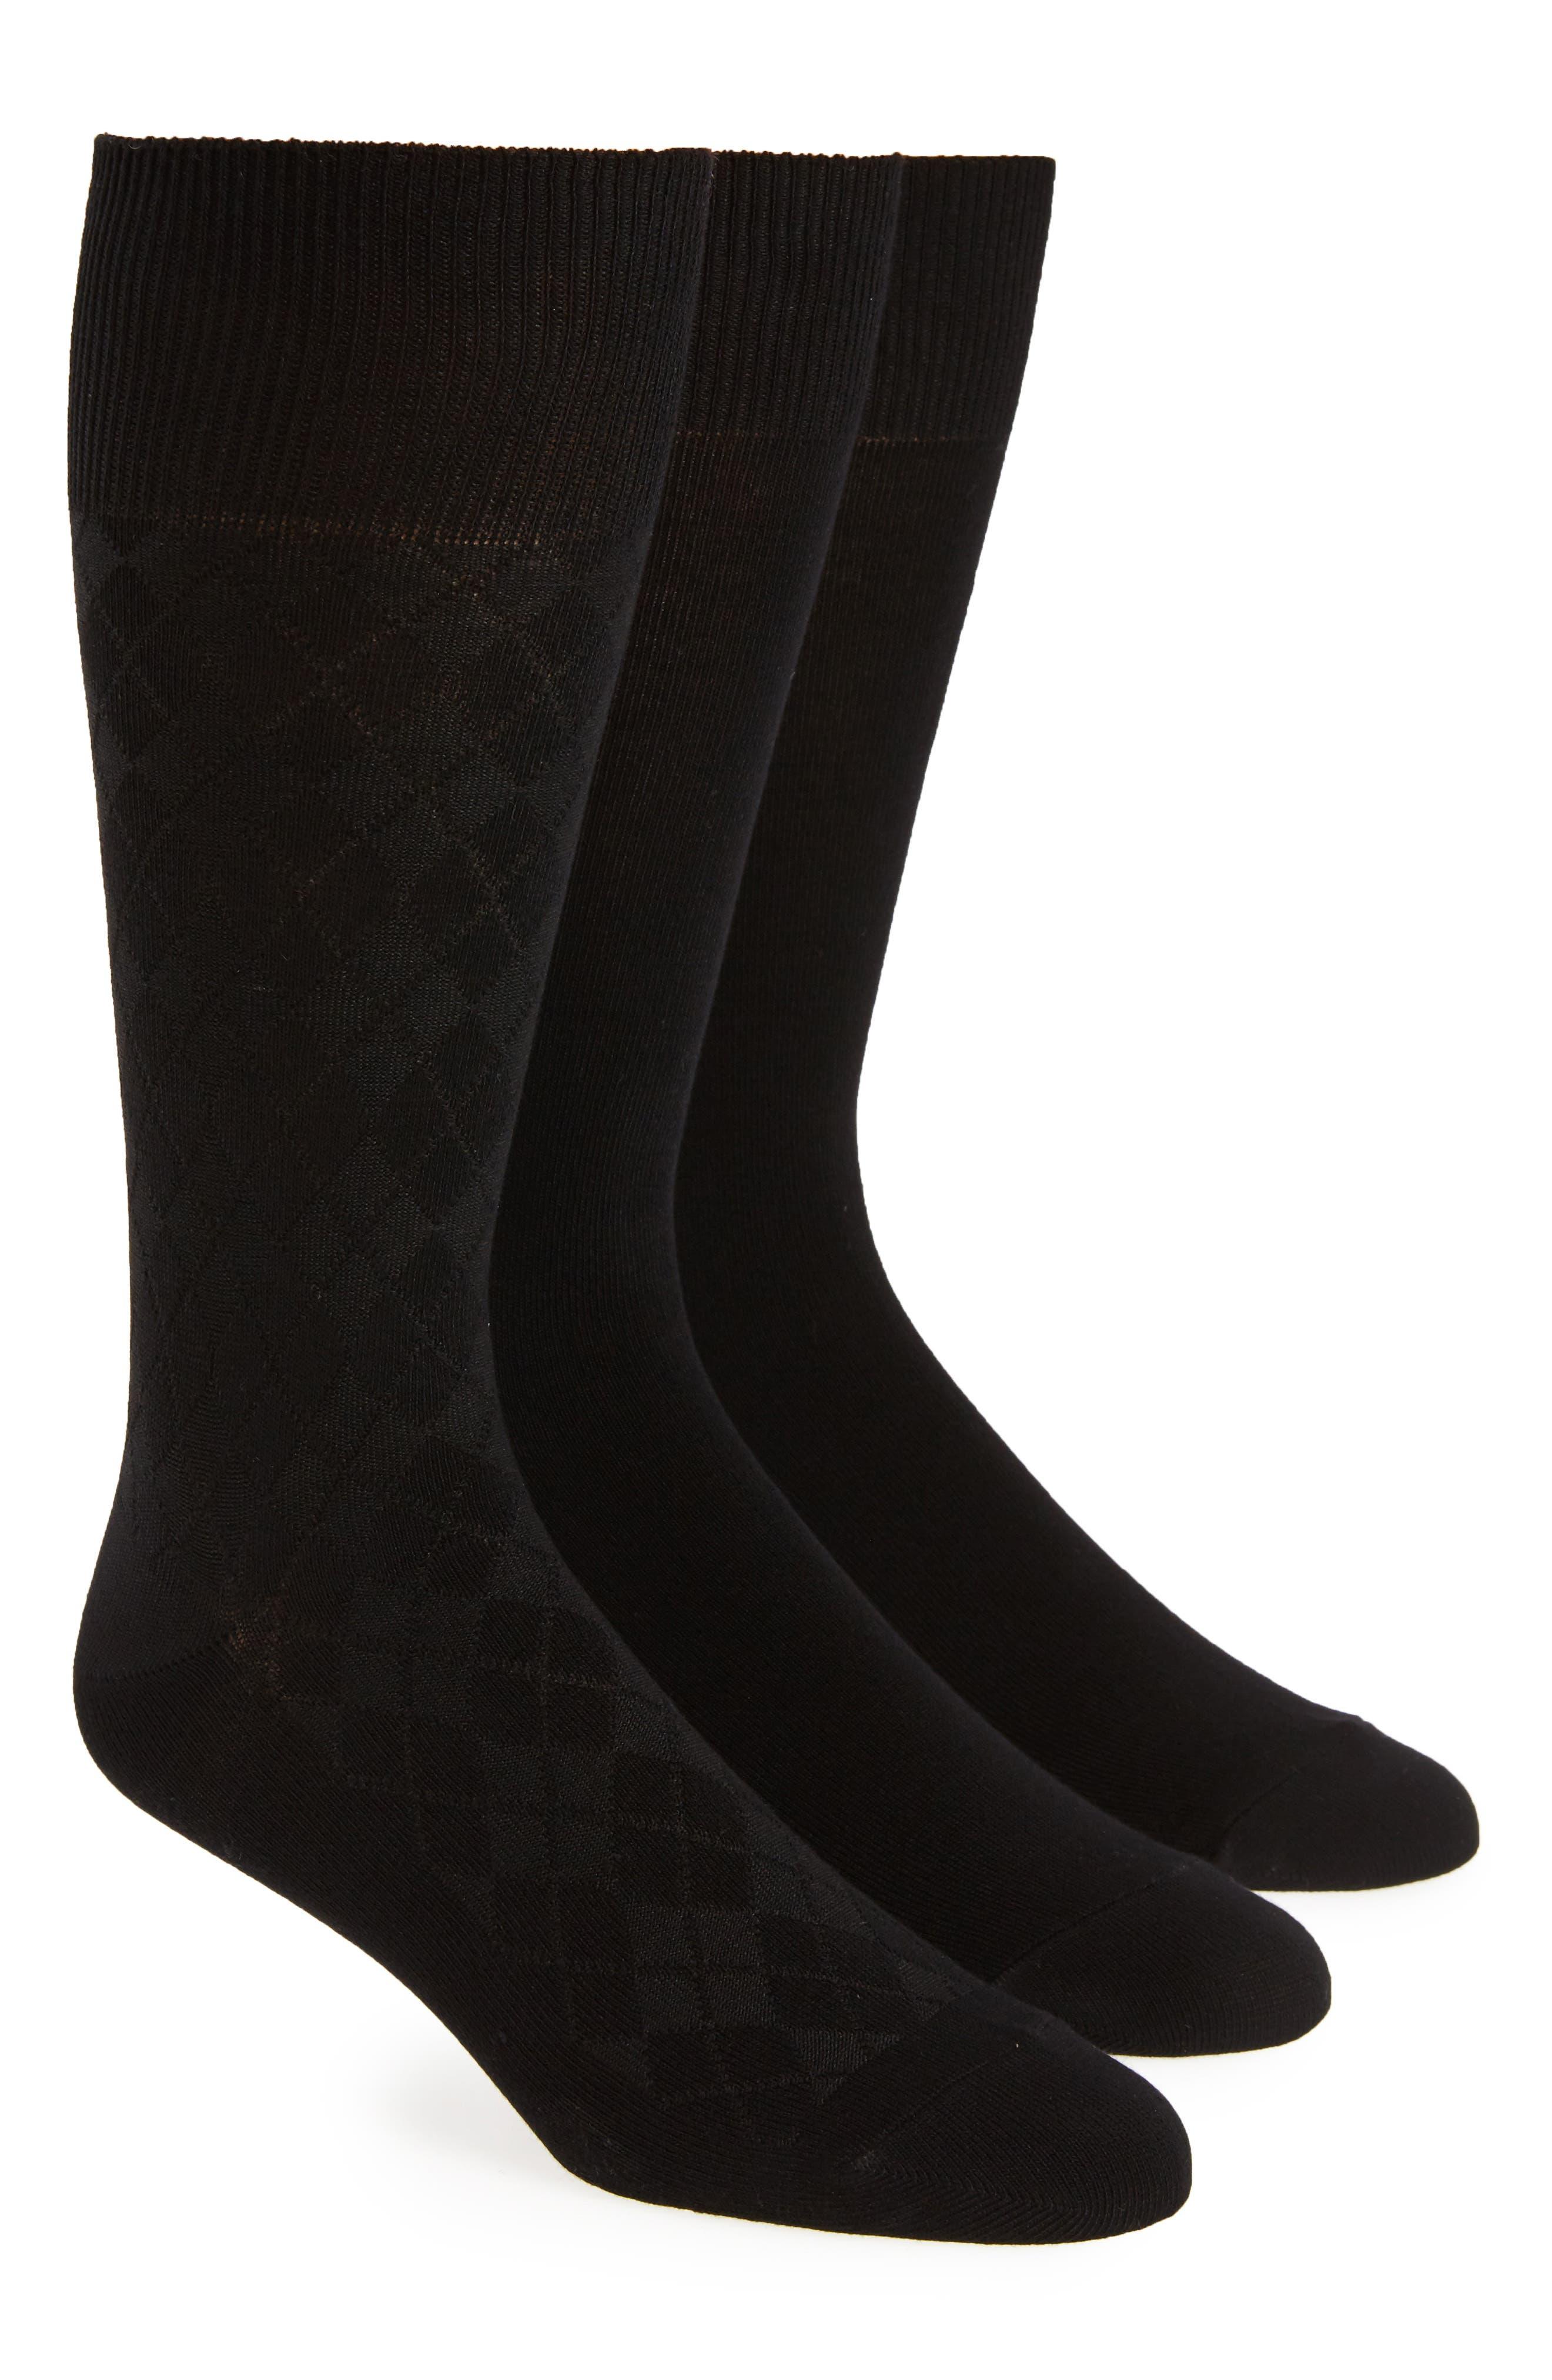 3-Pack Socks,                             Main thumbnail 1, color,                             BLACK